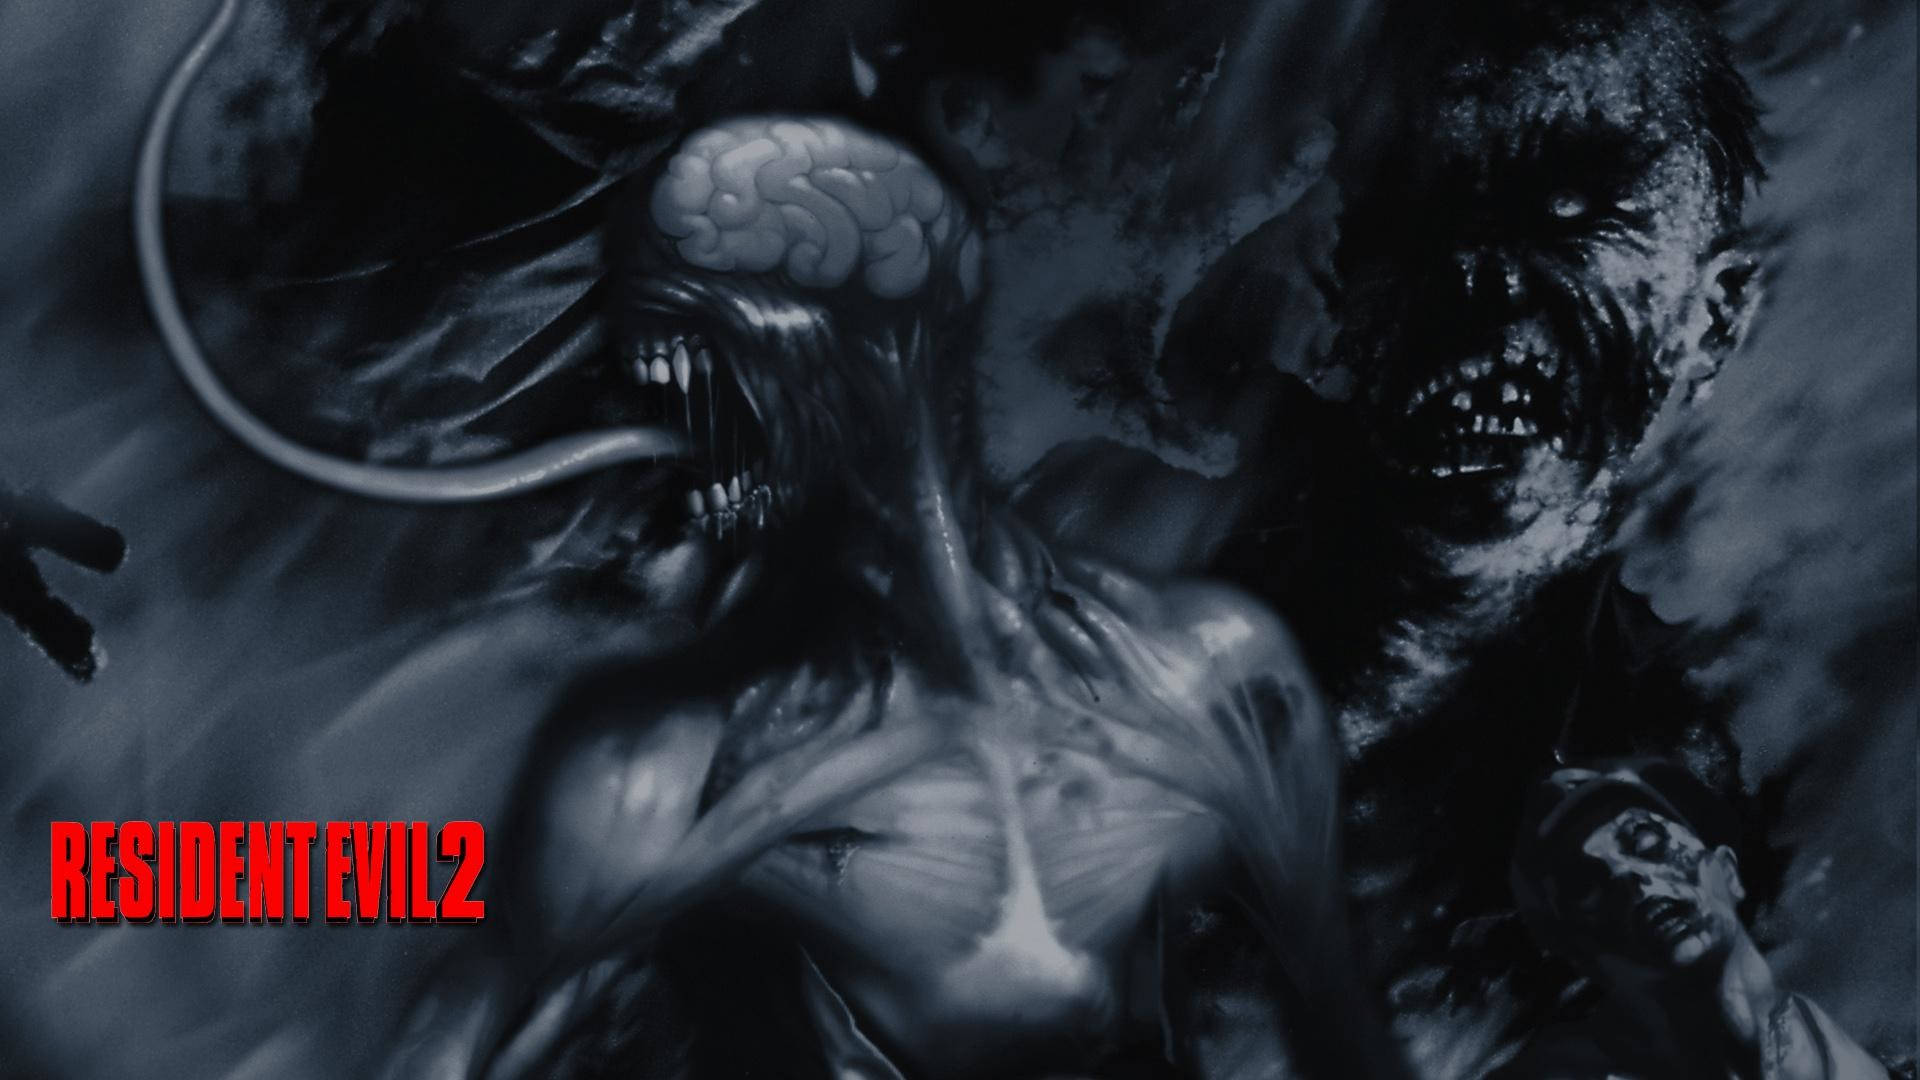 Resident Evil Umbrella Corp Wallpaper (72+ images)